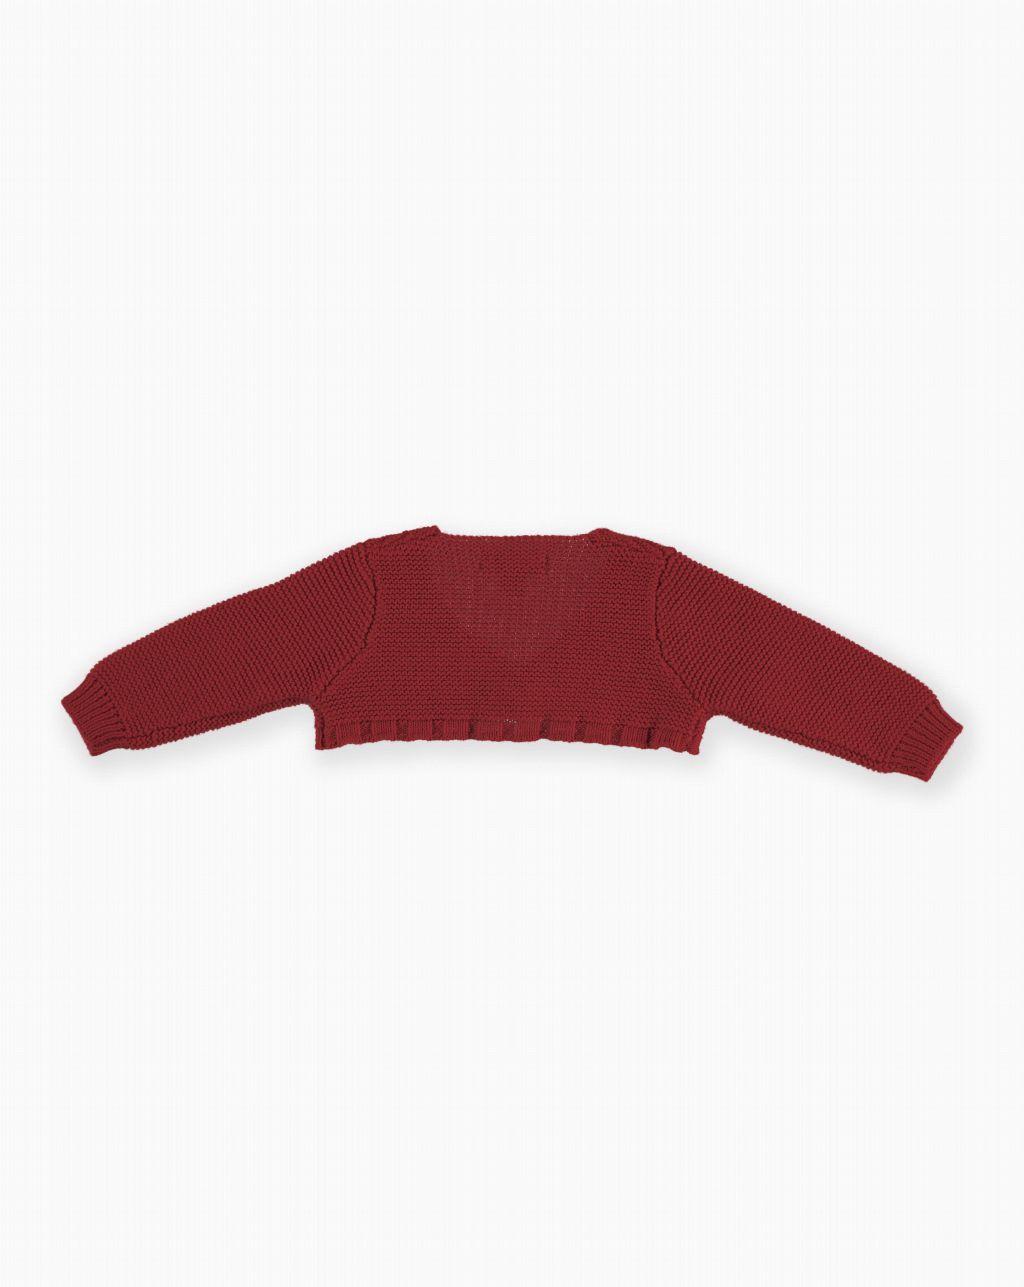 Pan con Chocolate: Chaqueta tricot Otoño